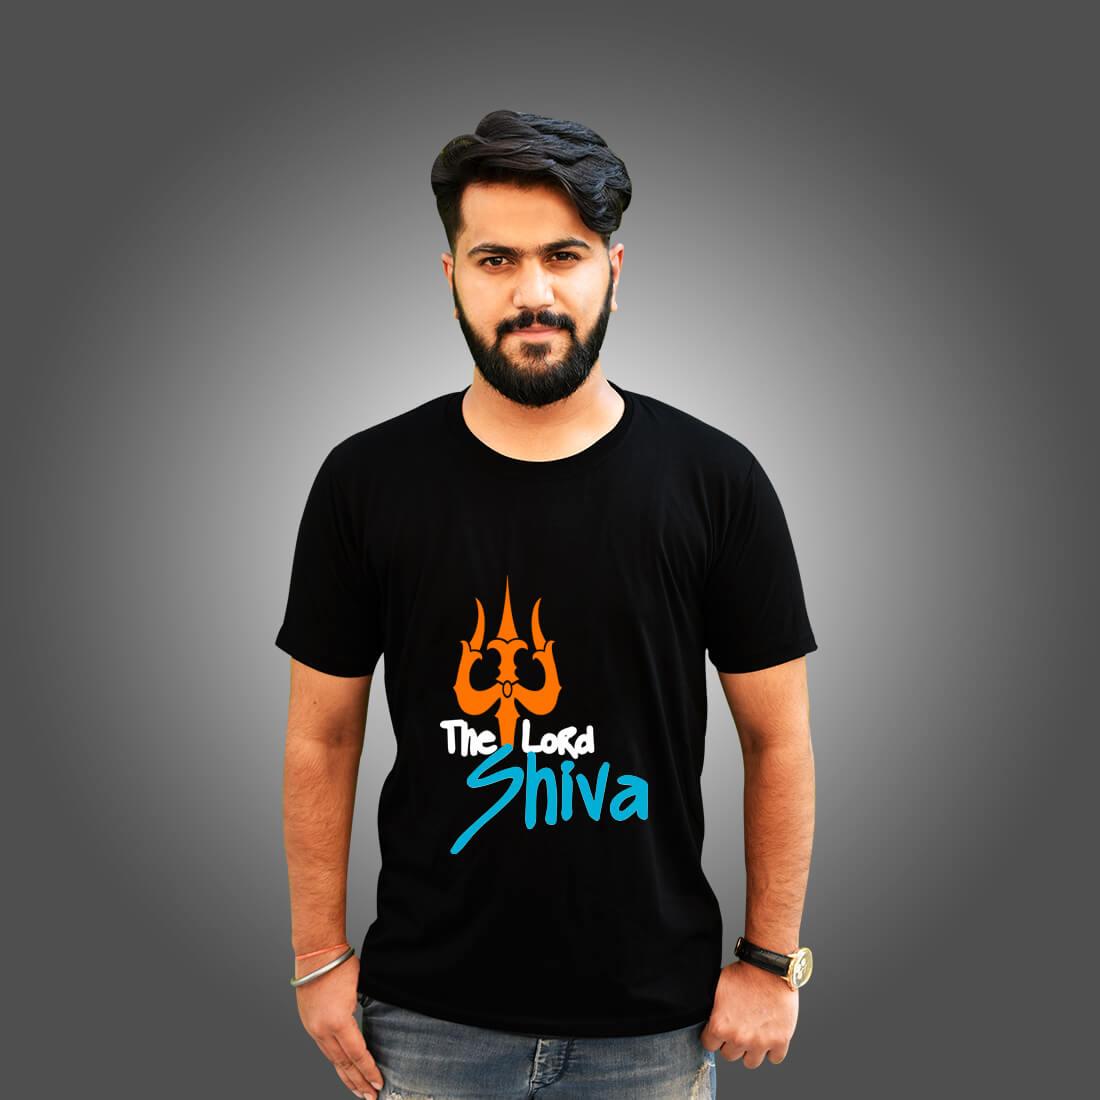 The Lord Shiva Printed Black T Shirt Men